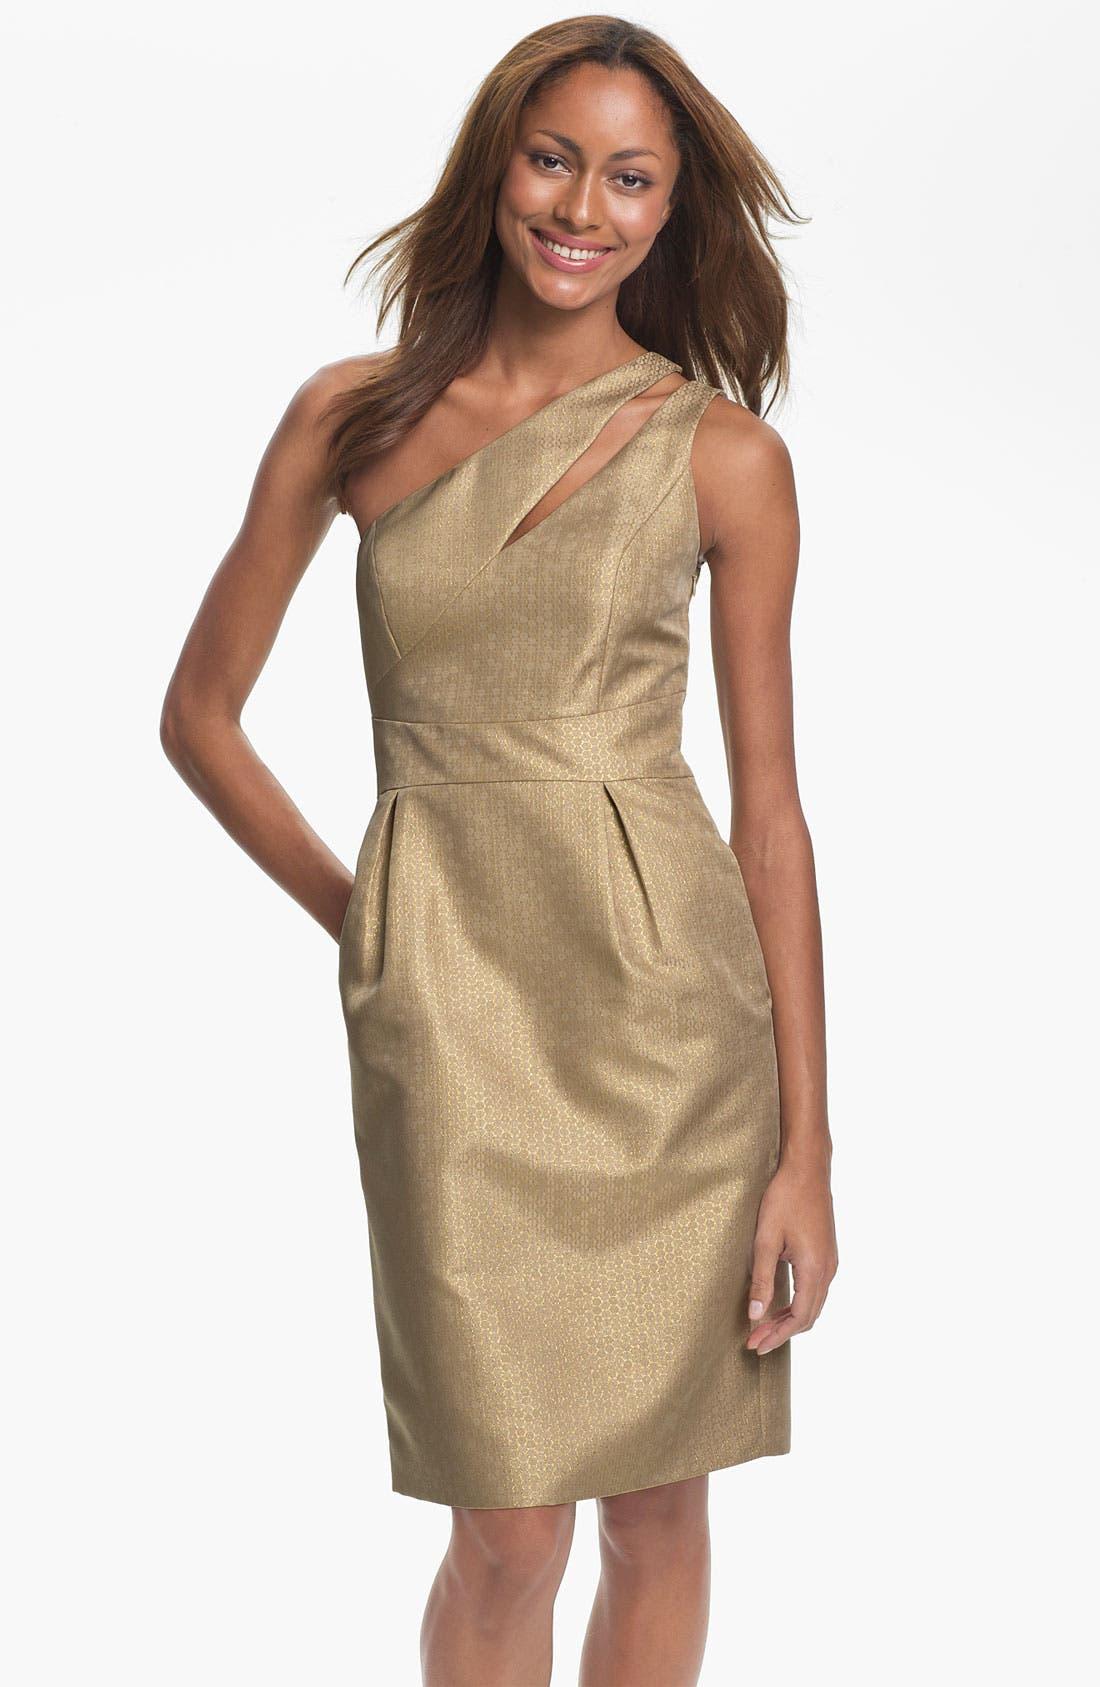 Alternate Image 1 Selected - ML Monique Lhuillier Bridesmaids One Shoulder Metallic Woven Sheath Dress (Nordstrom Exclusive)